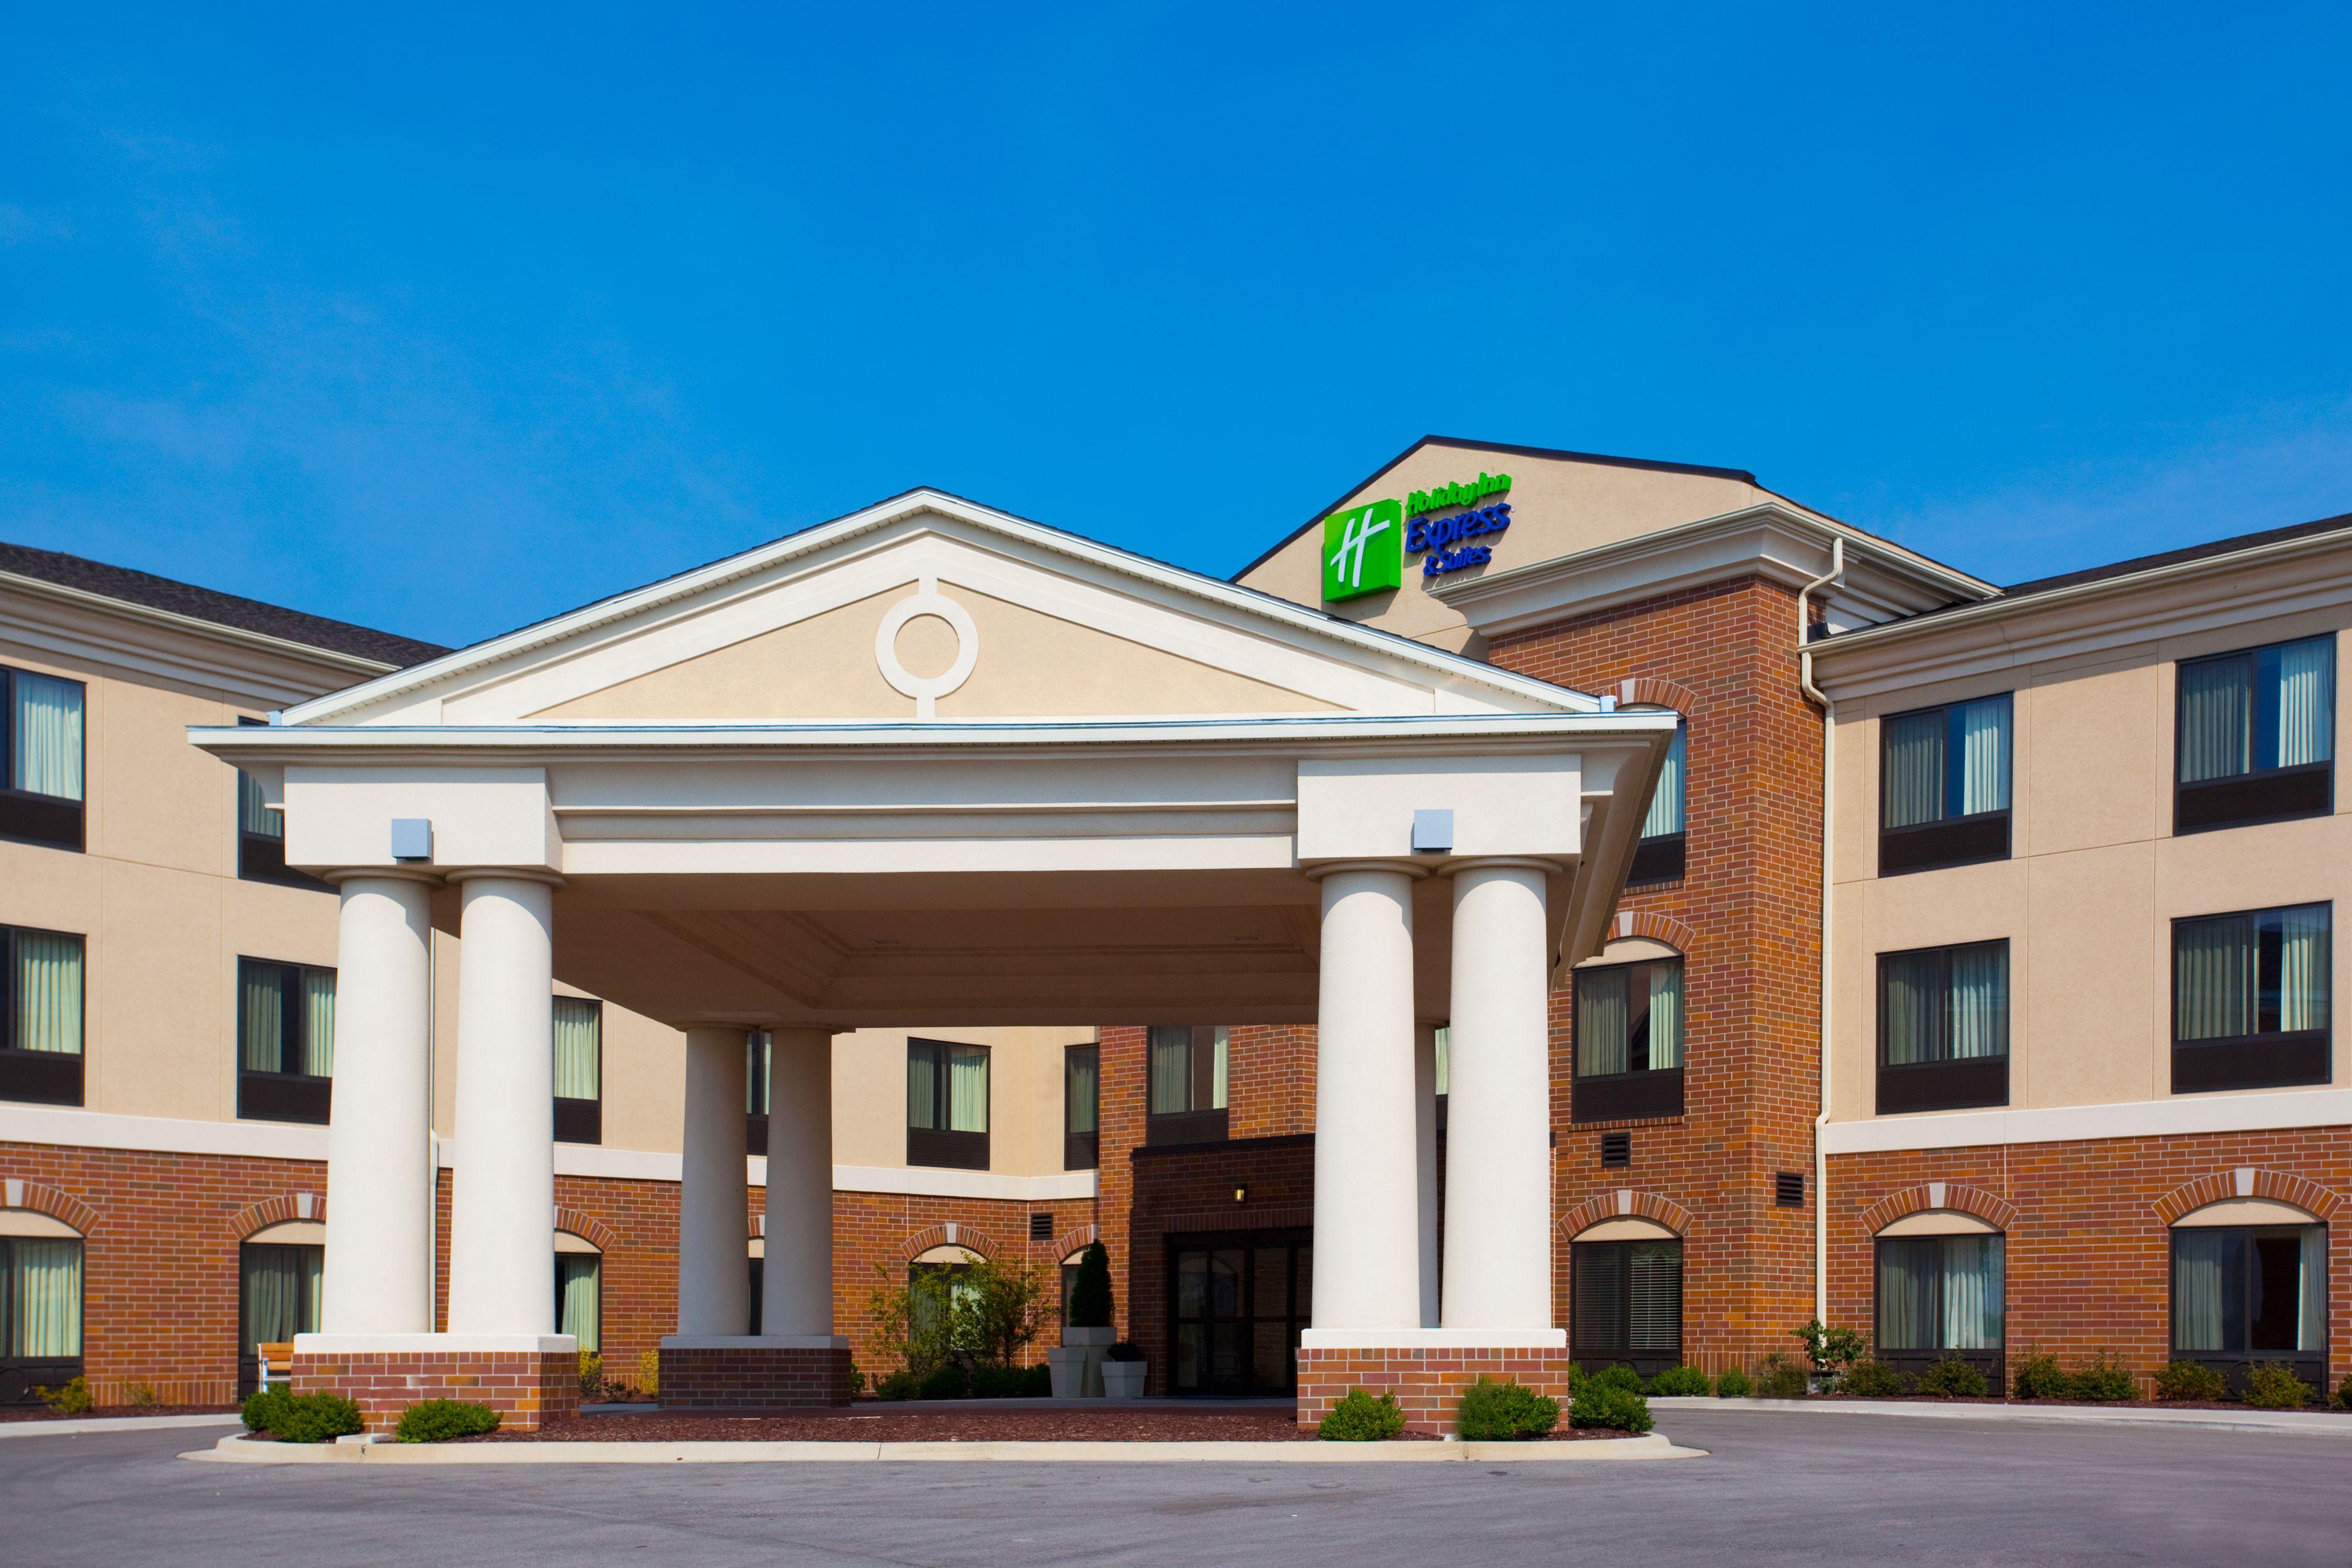 Holiday Inn Express Morgantown Hotel by IHG